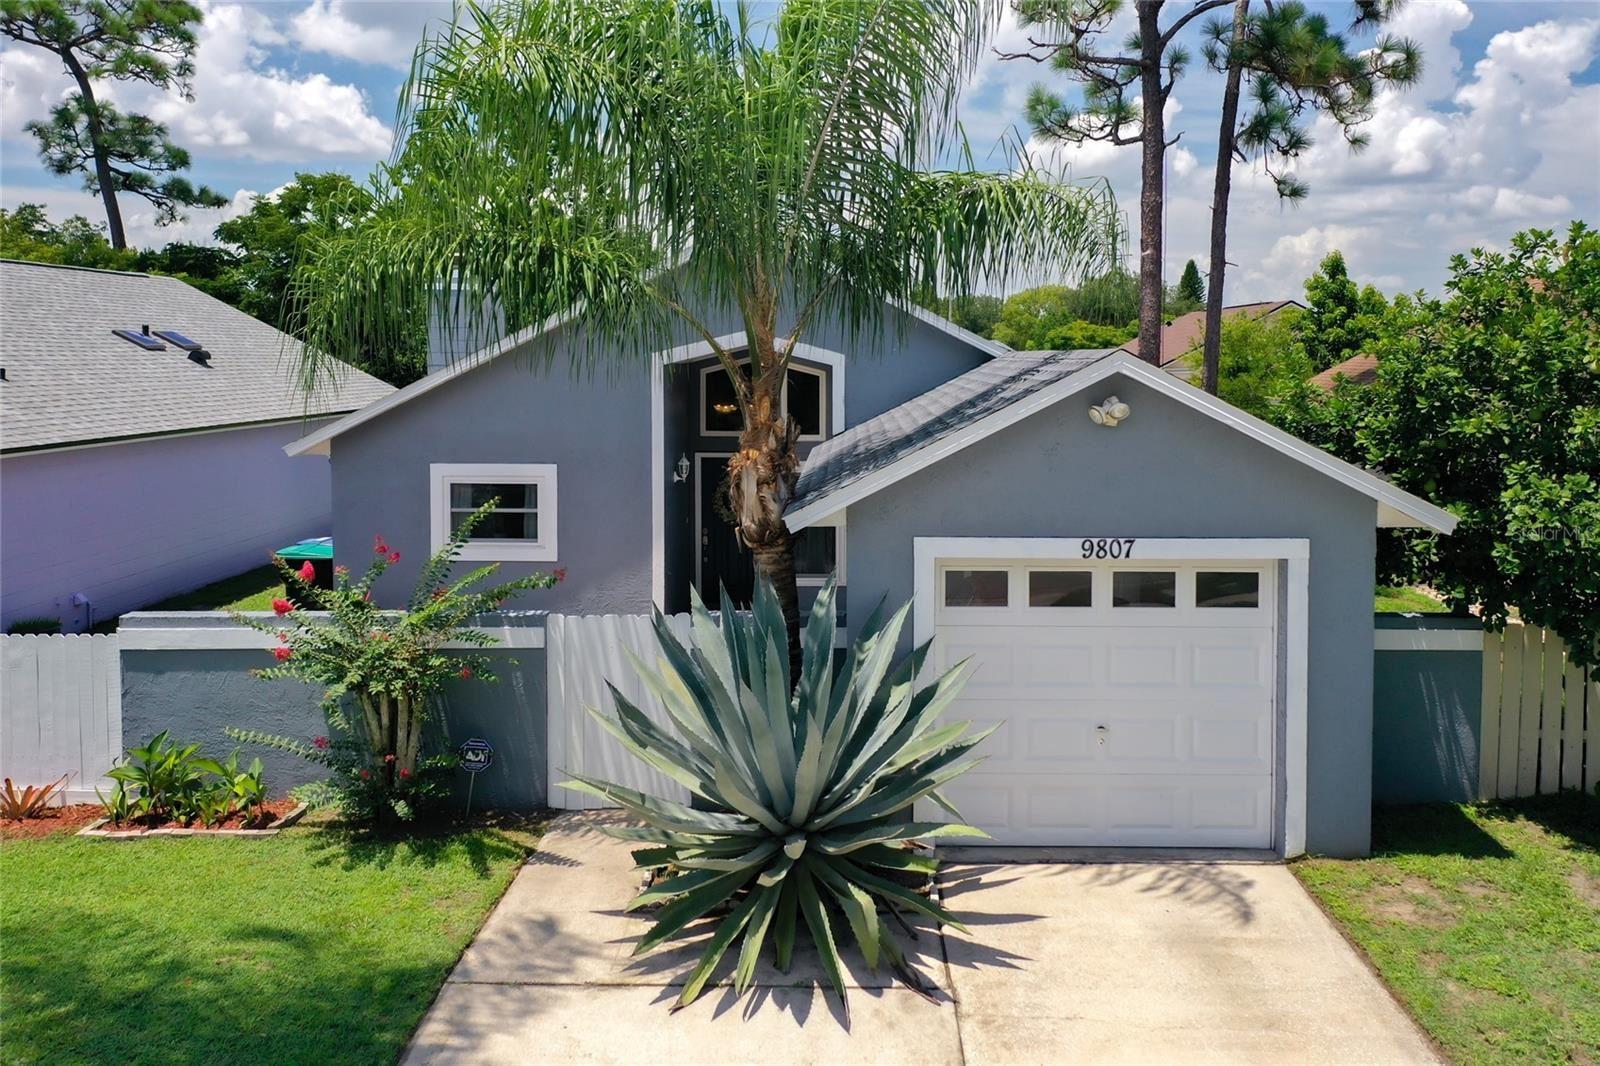 9807 PINEY POINT CIRCLE, Orlando, FL 32825 - #: O5958302